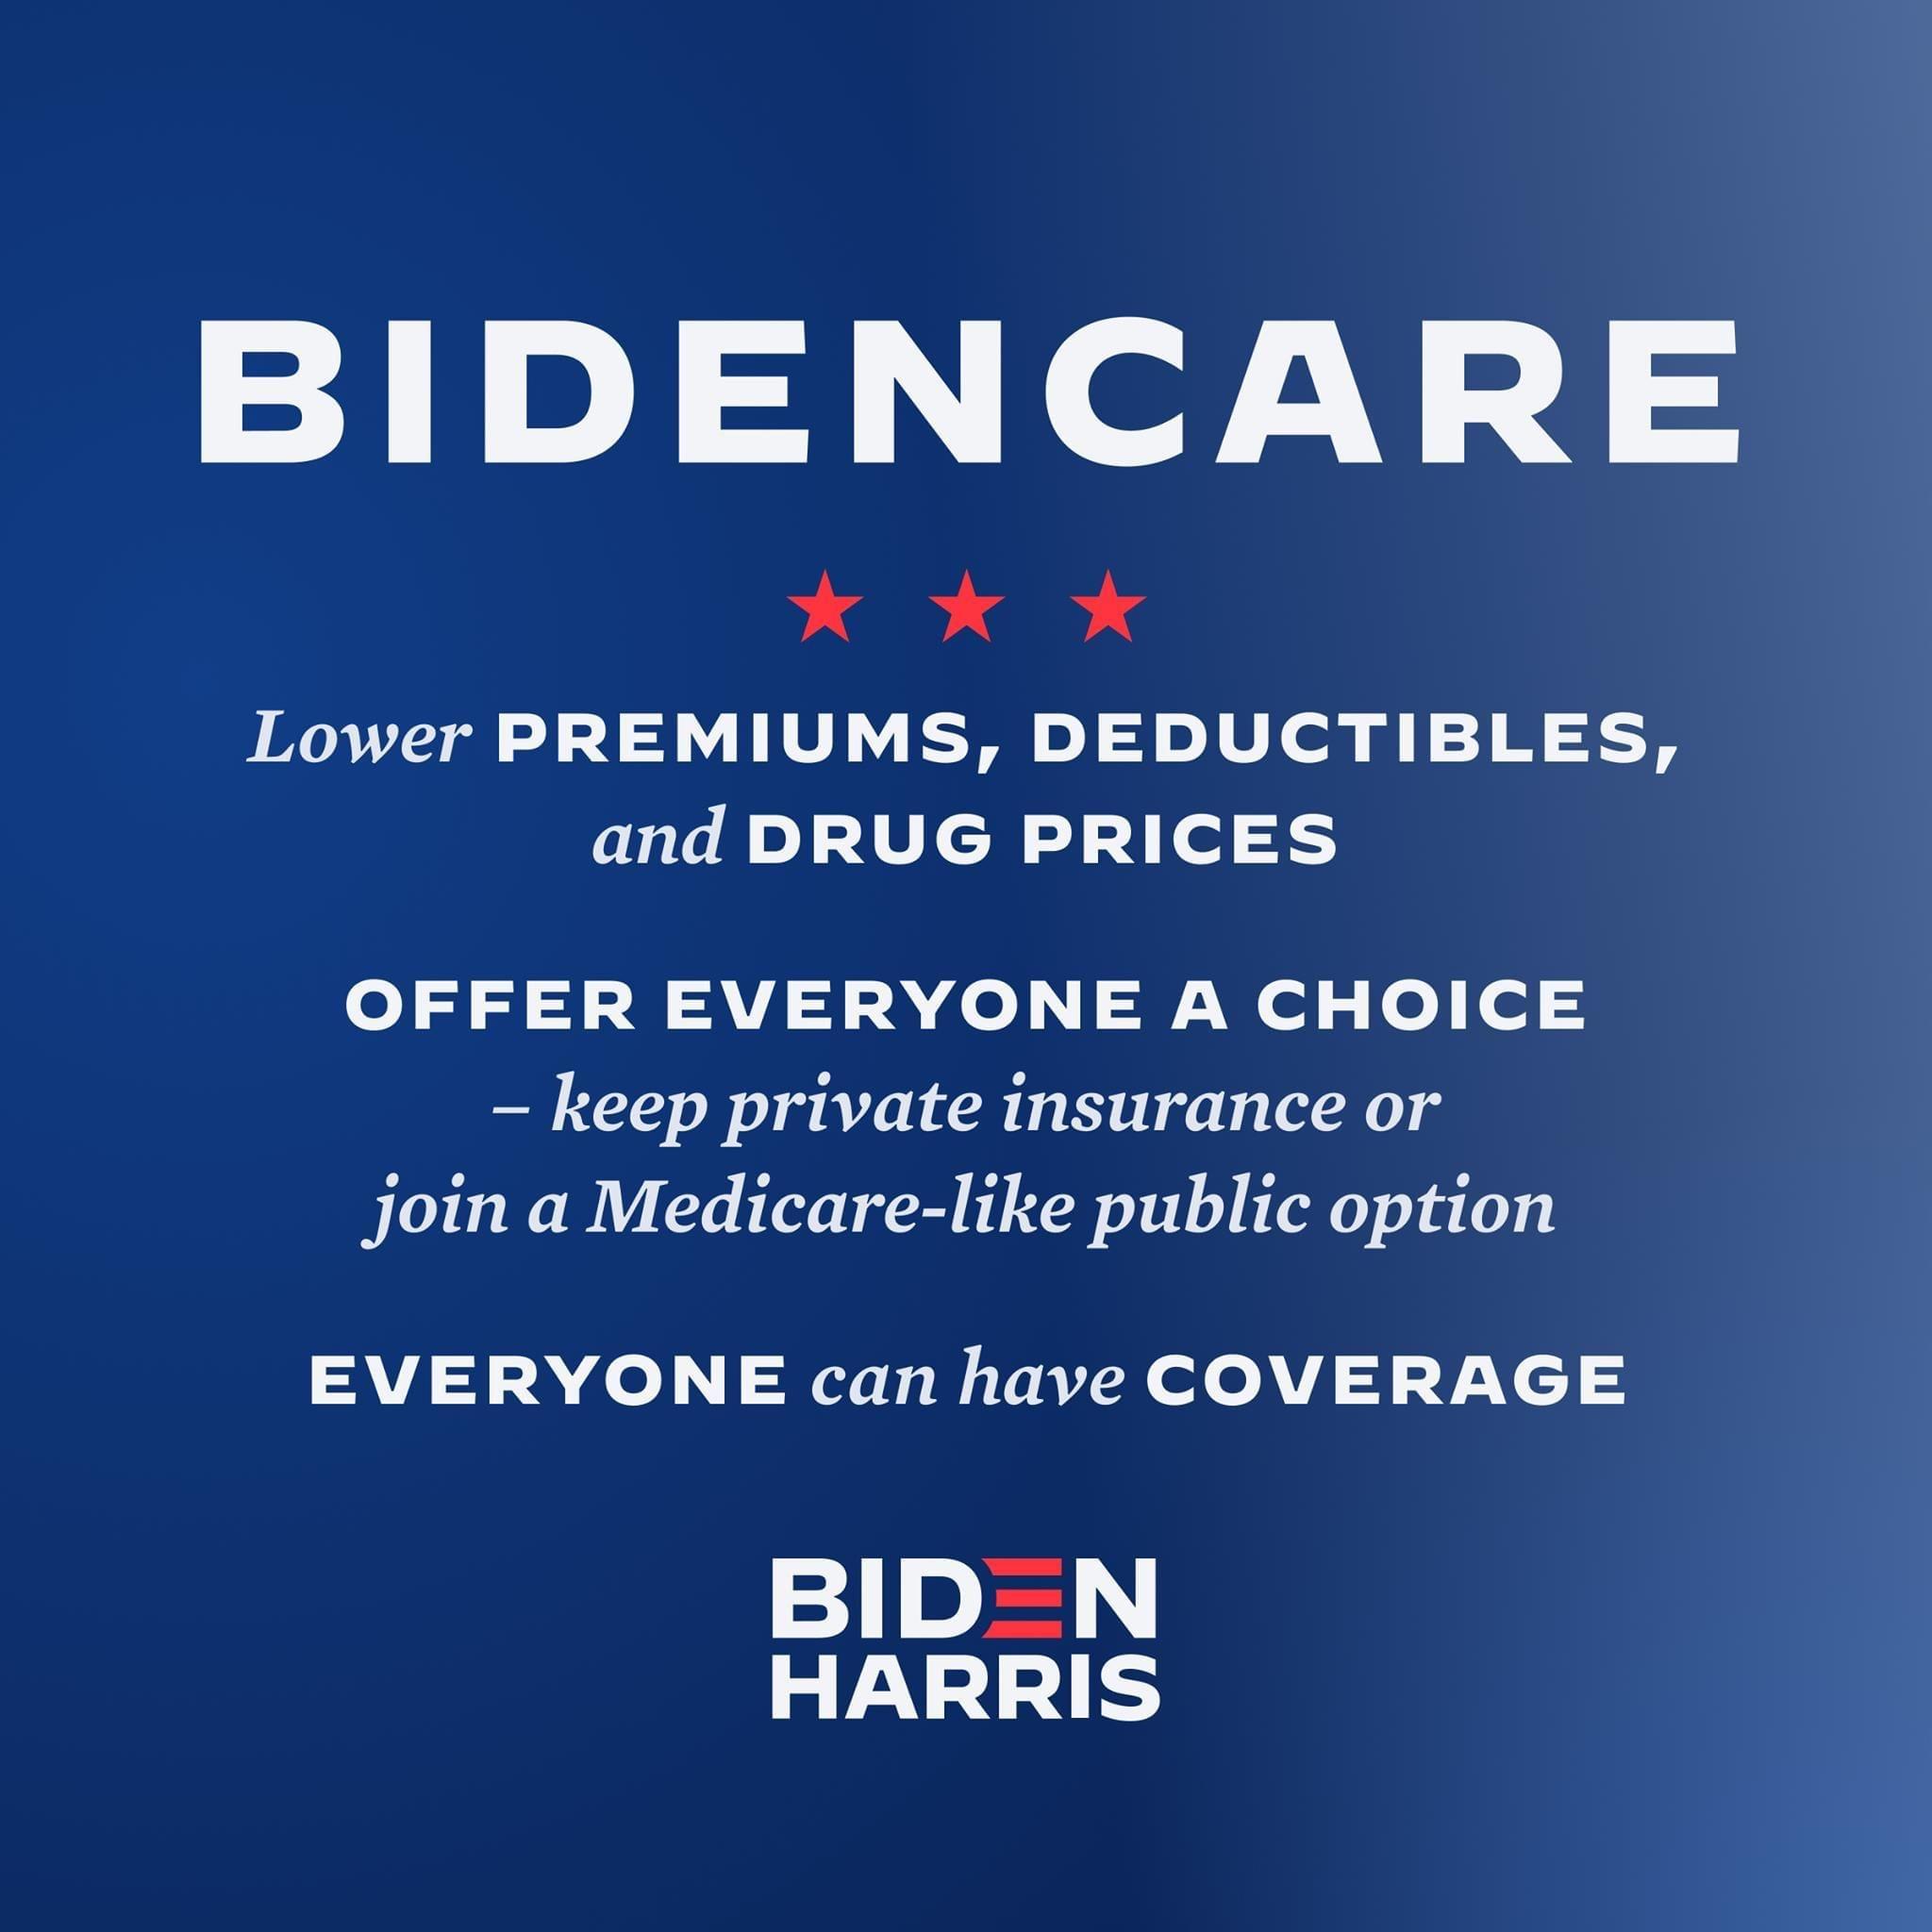 Bidencare